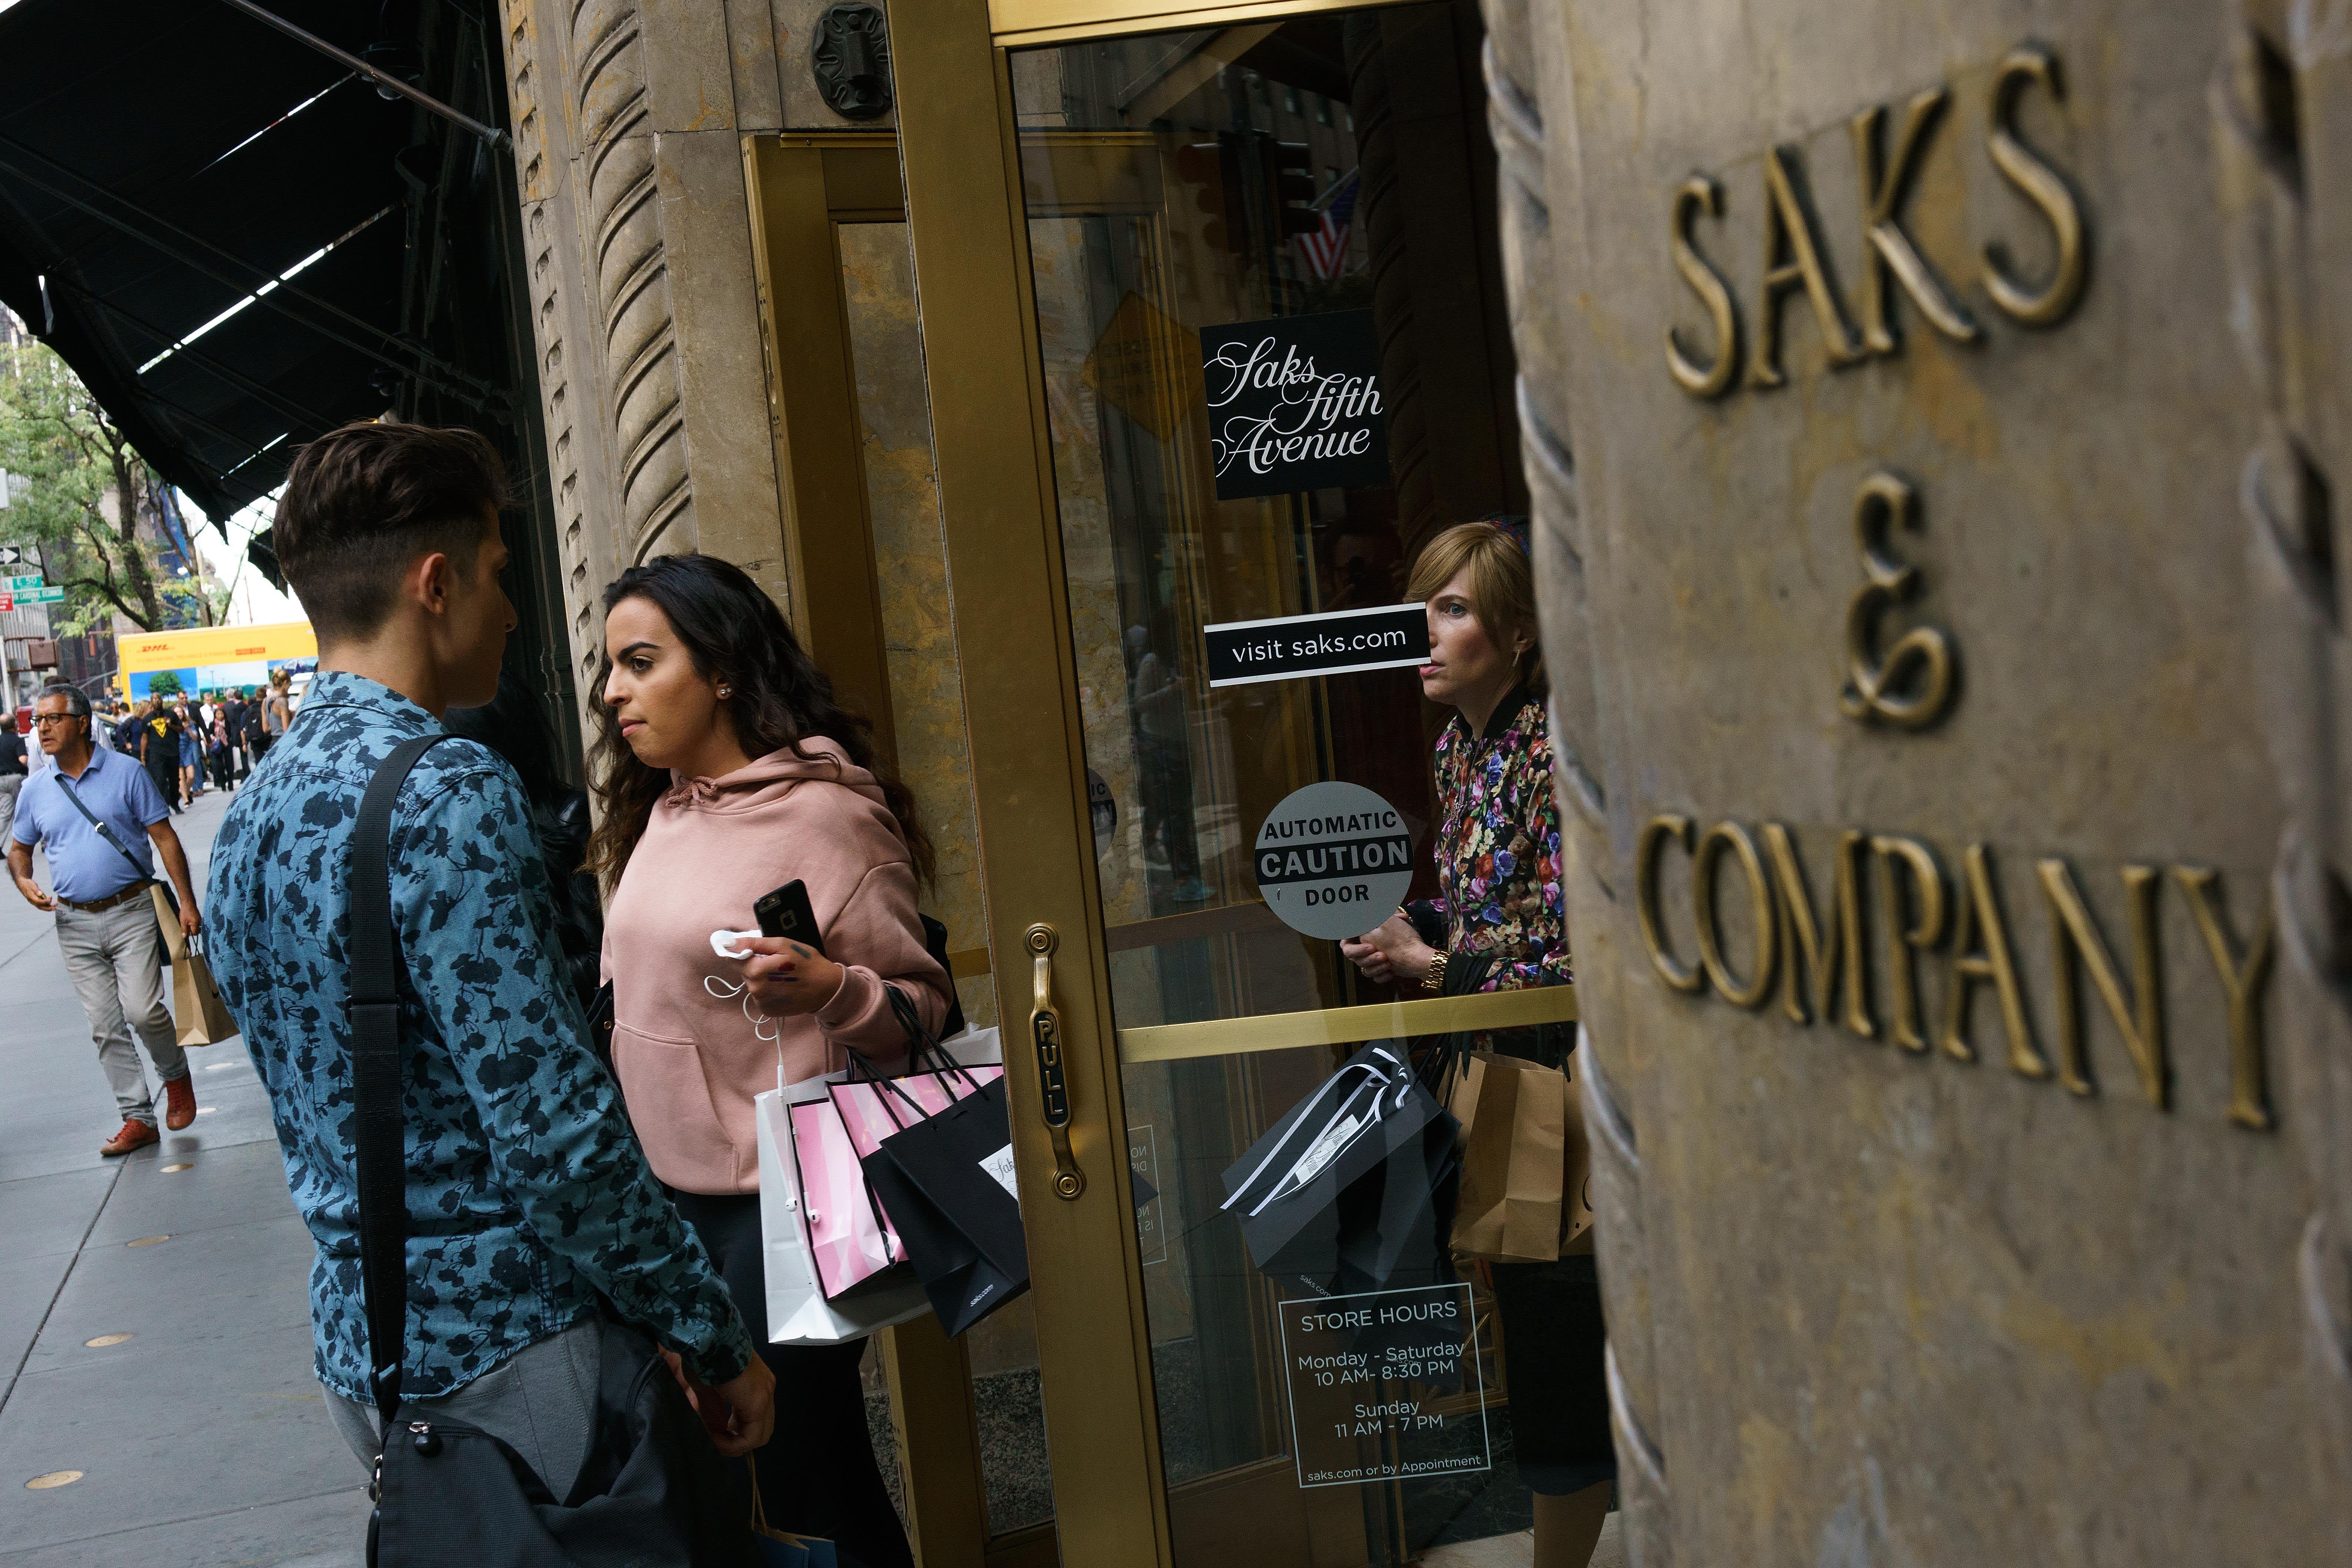 Saks Fifth Avenue Light Show 2020 Schedule Barneys' bankruptcy sheds a light on the New York real estate market